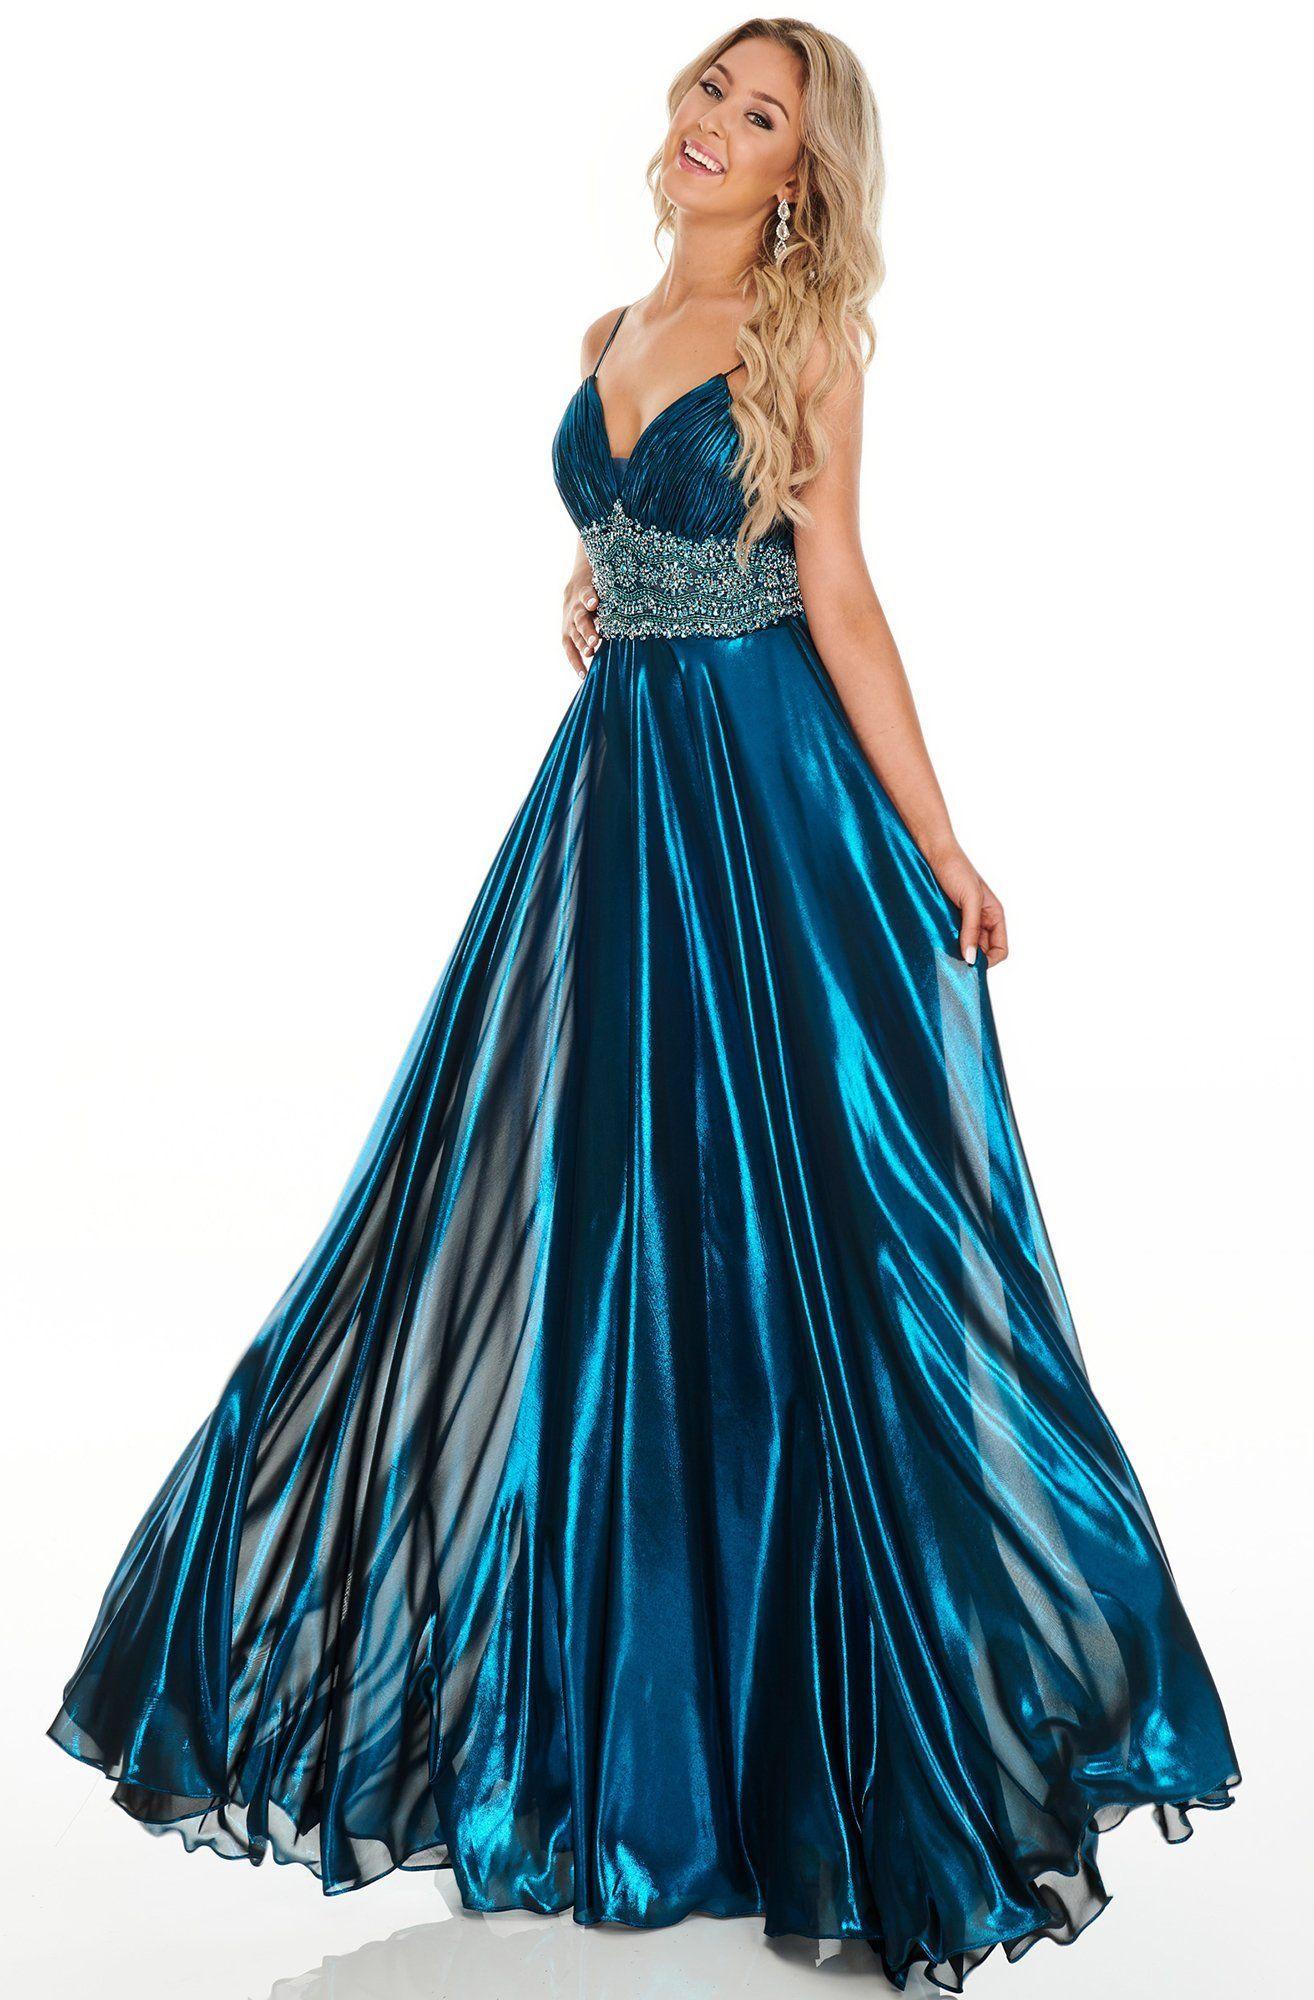 Rachel Allan Prom 7182 Beaded Midriff Metallic Chiffon Gown Rachel Allan Dresses Chiffon Gown Gowns [ 2000 x 1314 Pixel ]